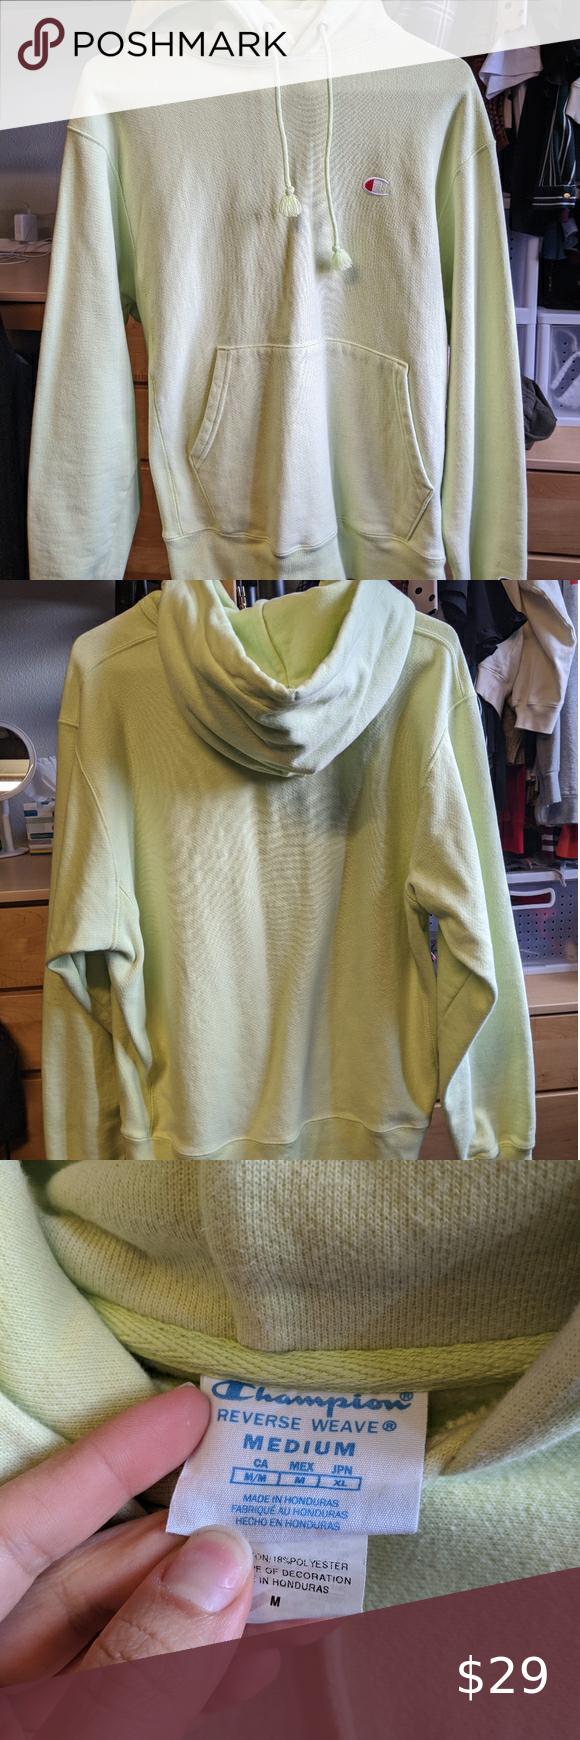 Champion Reverse Weave Hoodie Champion Reverse Weave Urban Outfitters Looks Sweatshirt Tops [ 1740 x 580 Pixel ]